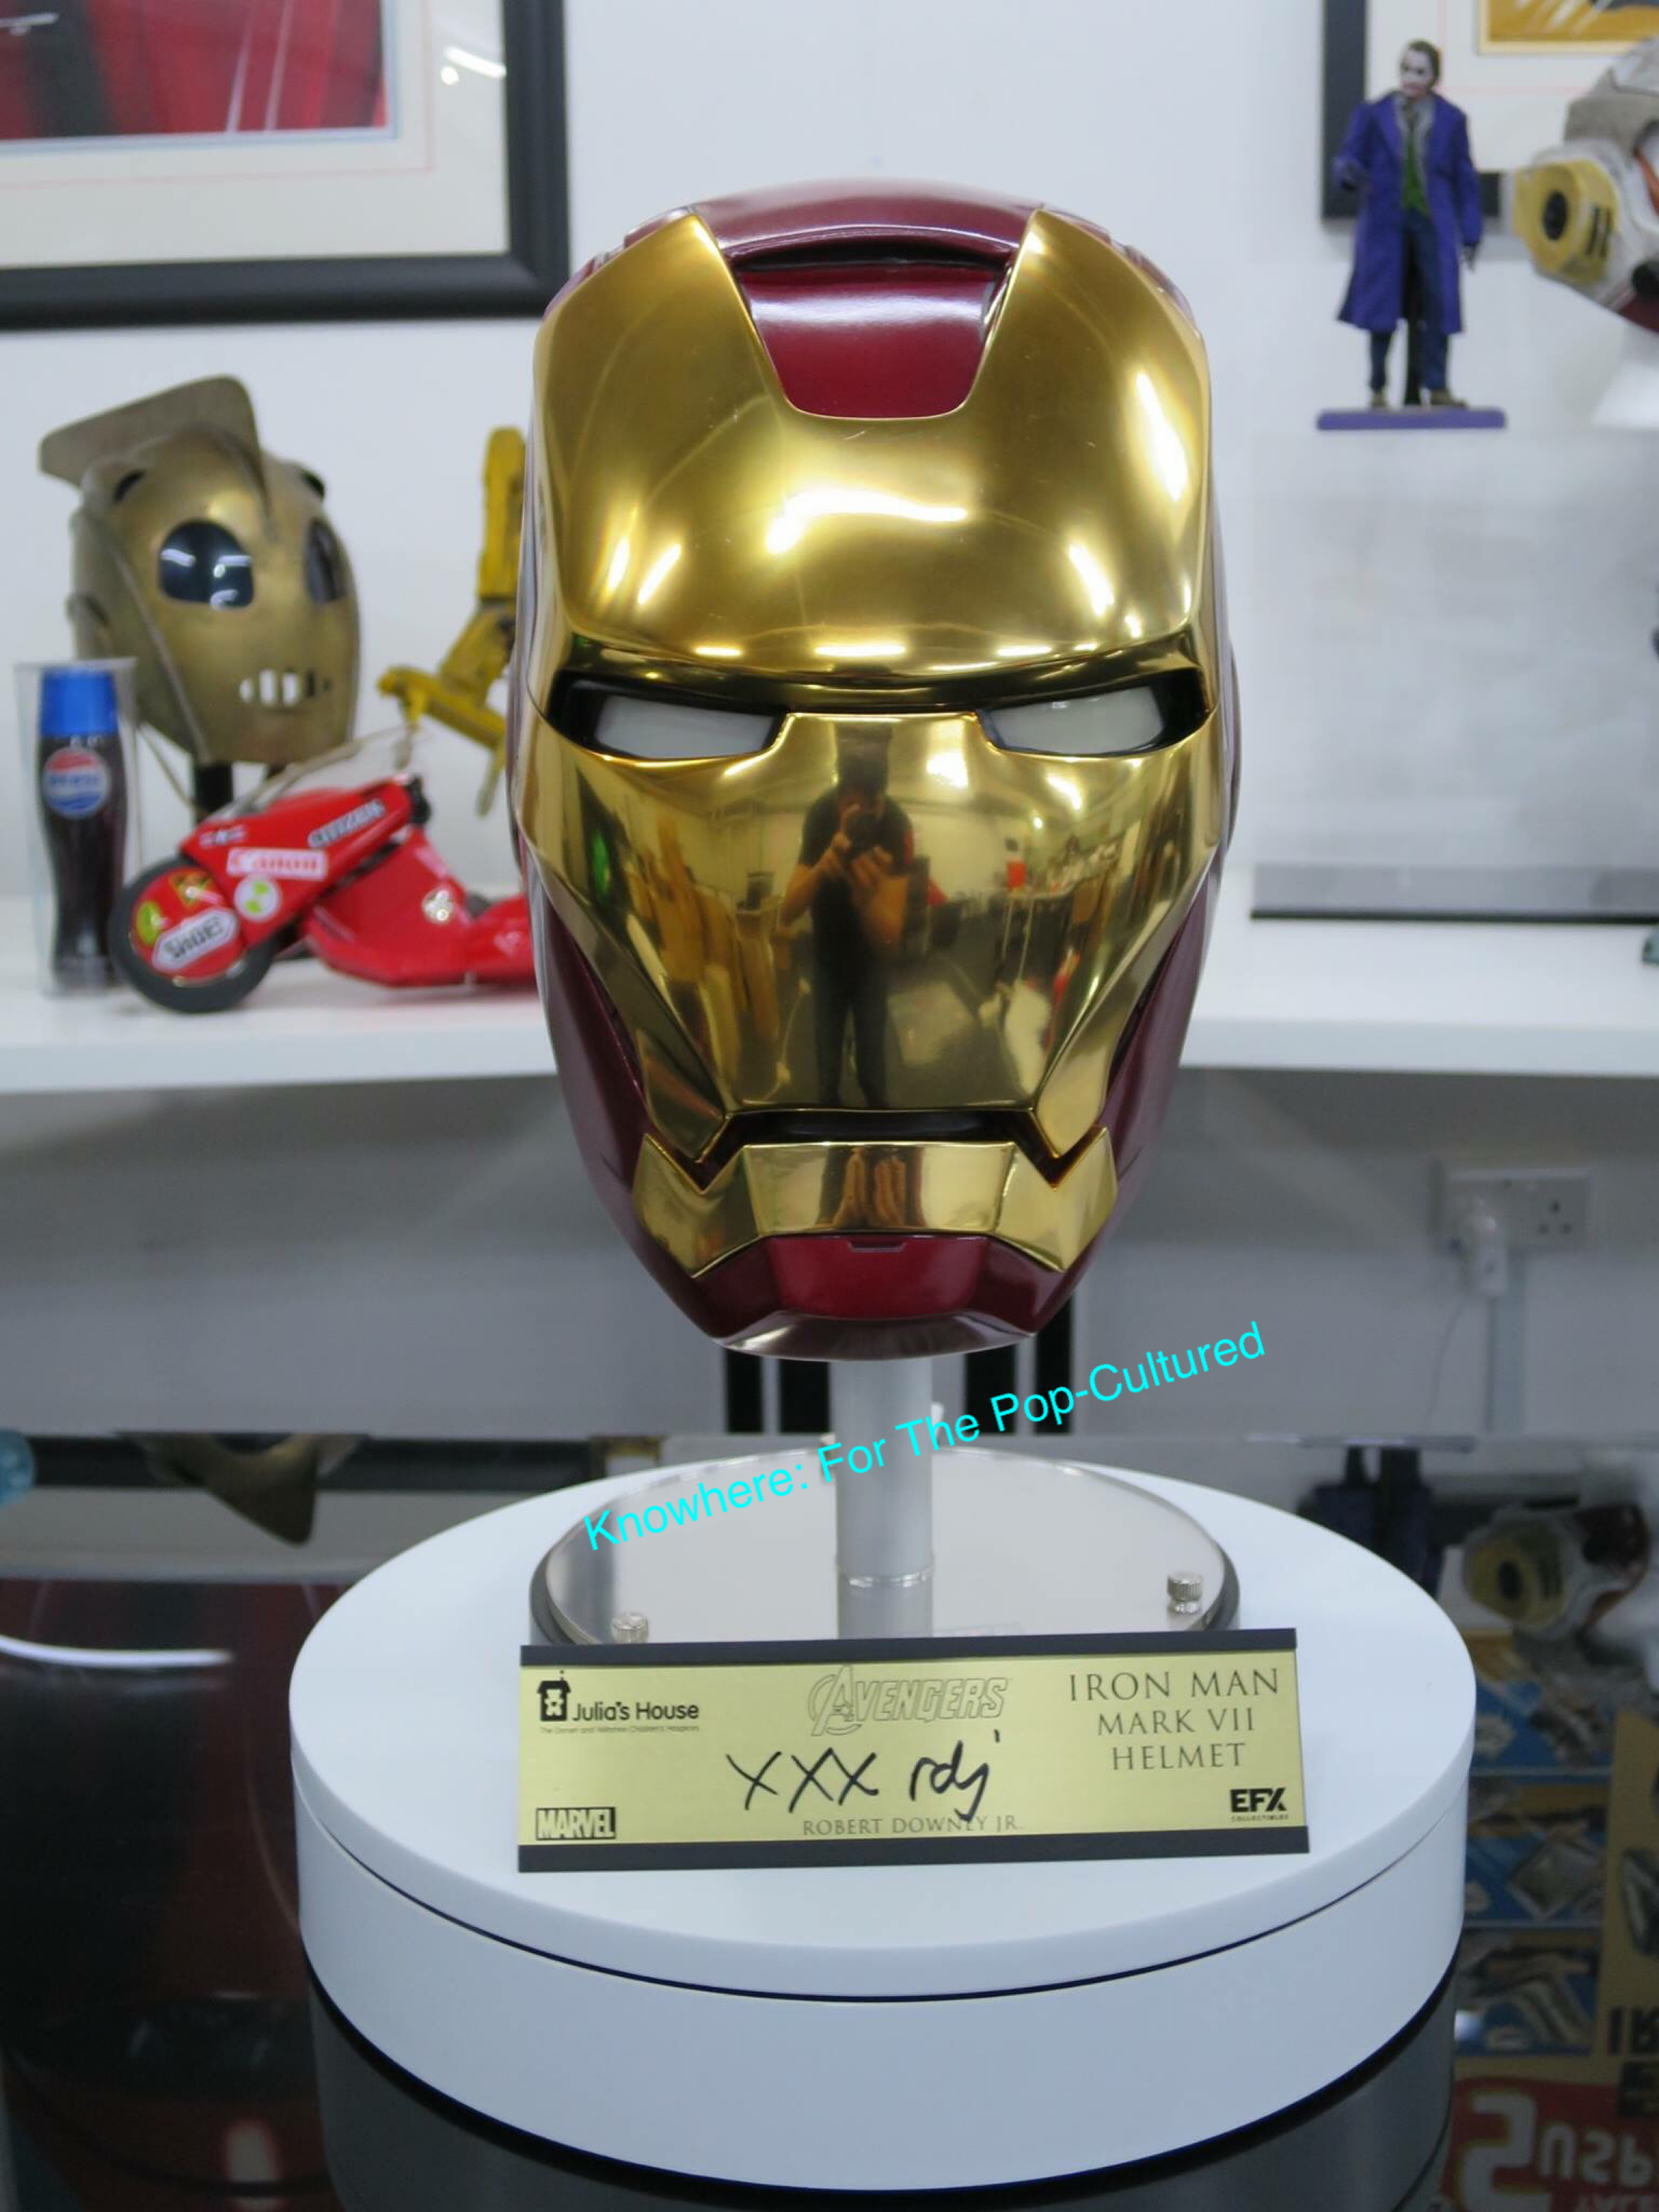 Efx Signature Edition Iron Man Helmet Replica Autographed By Robert Downey Jr Iron Man Iron Man Helmet Iron Man Suit